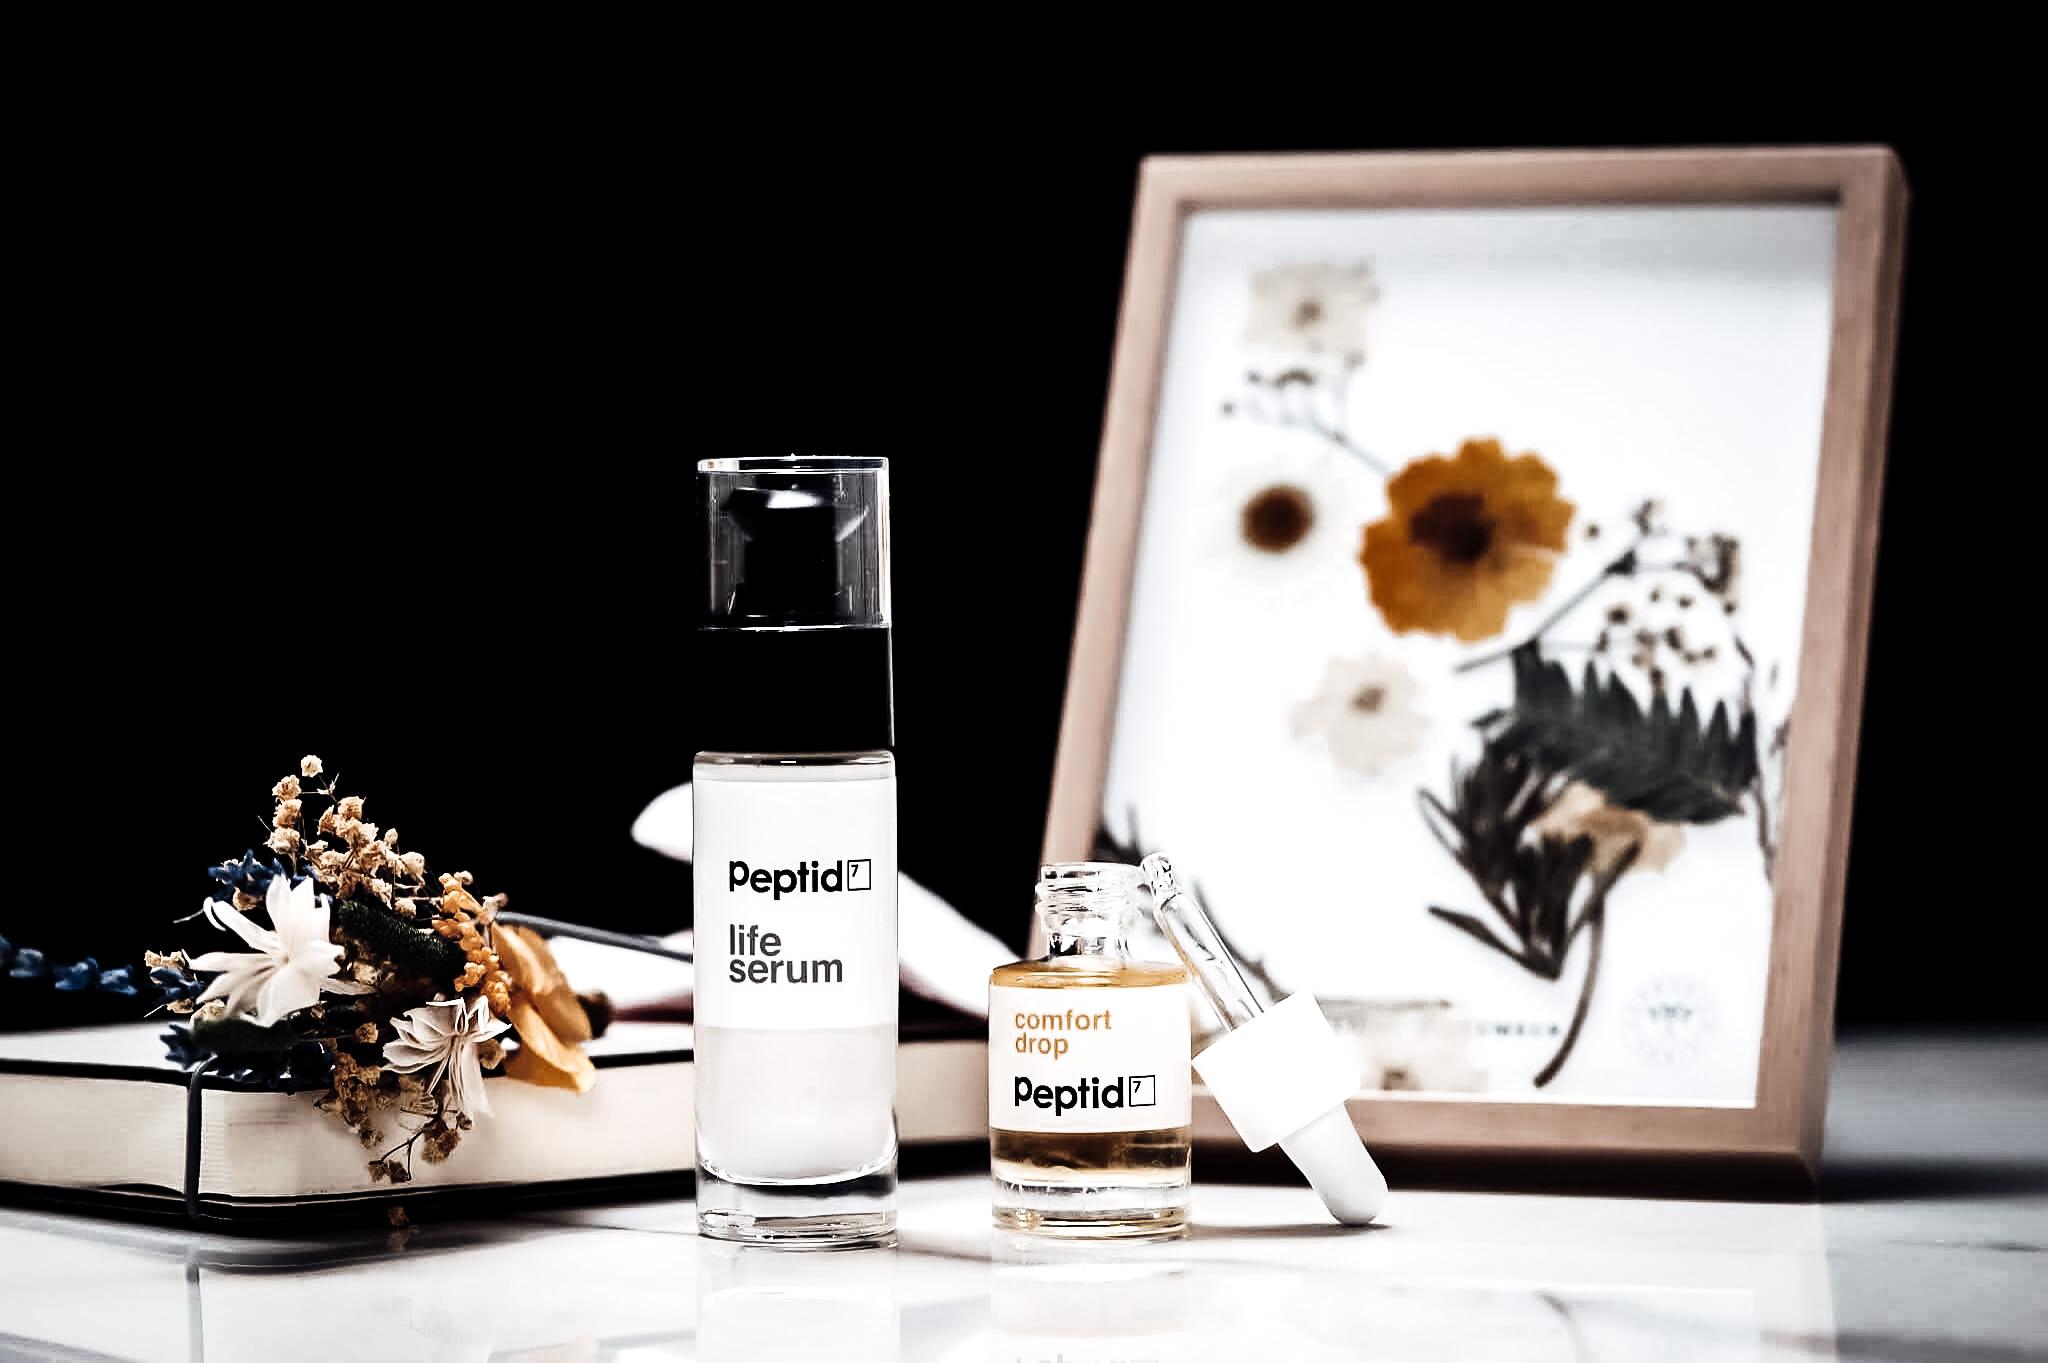 Peptid 7 Soins Visage Serum